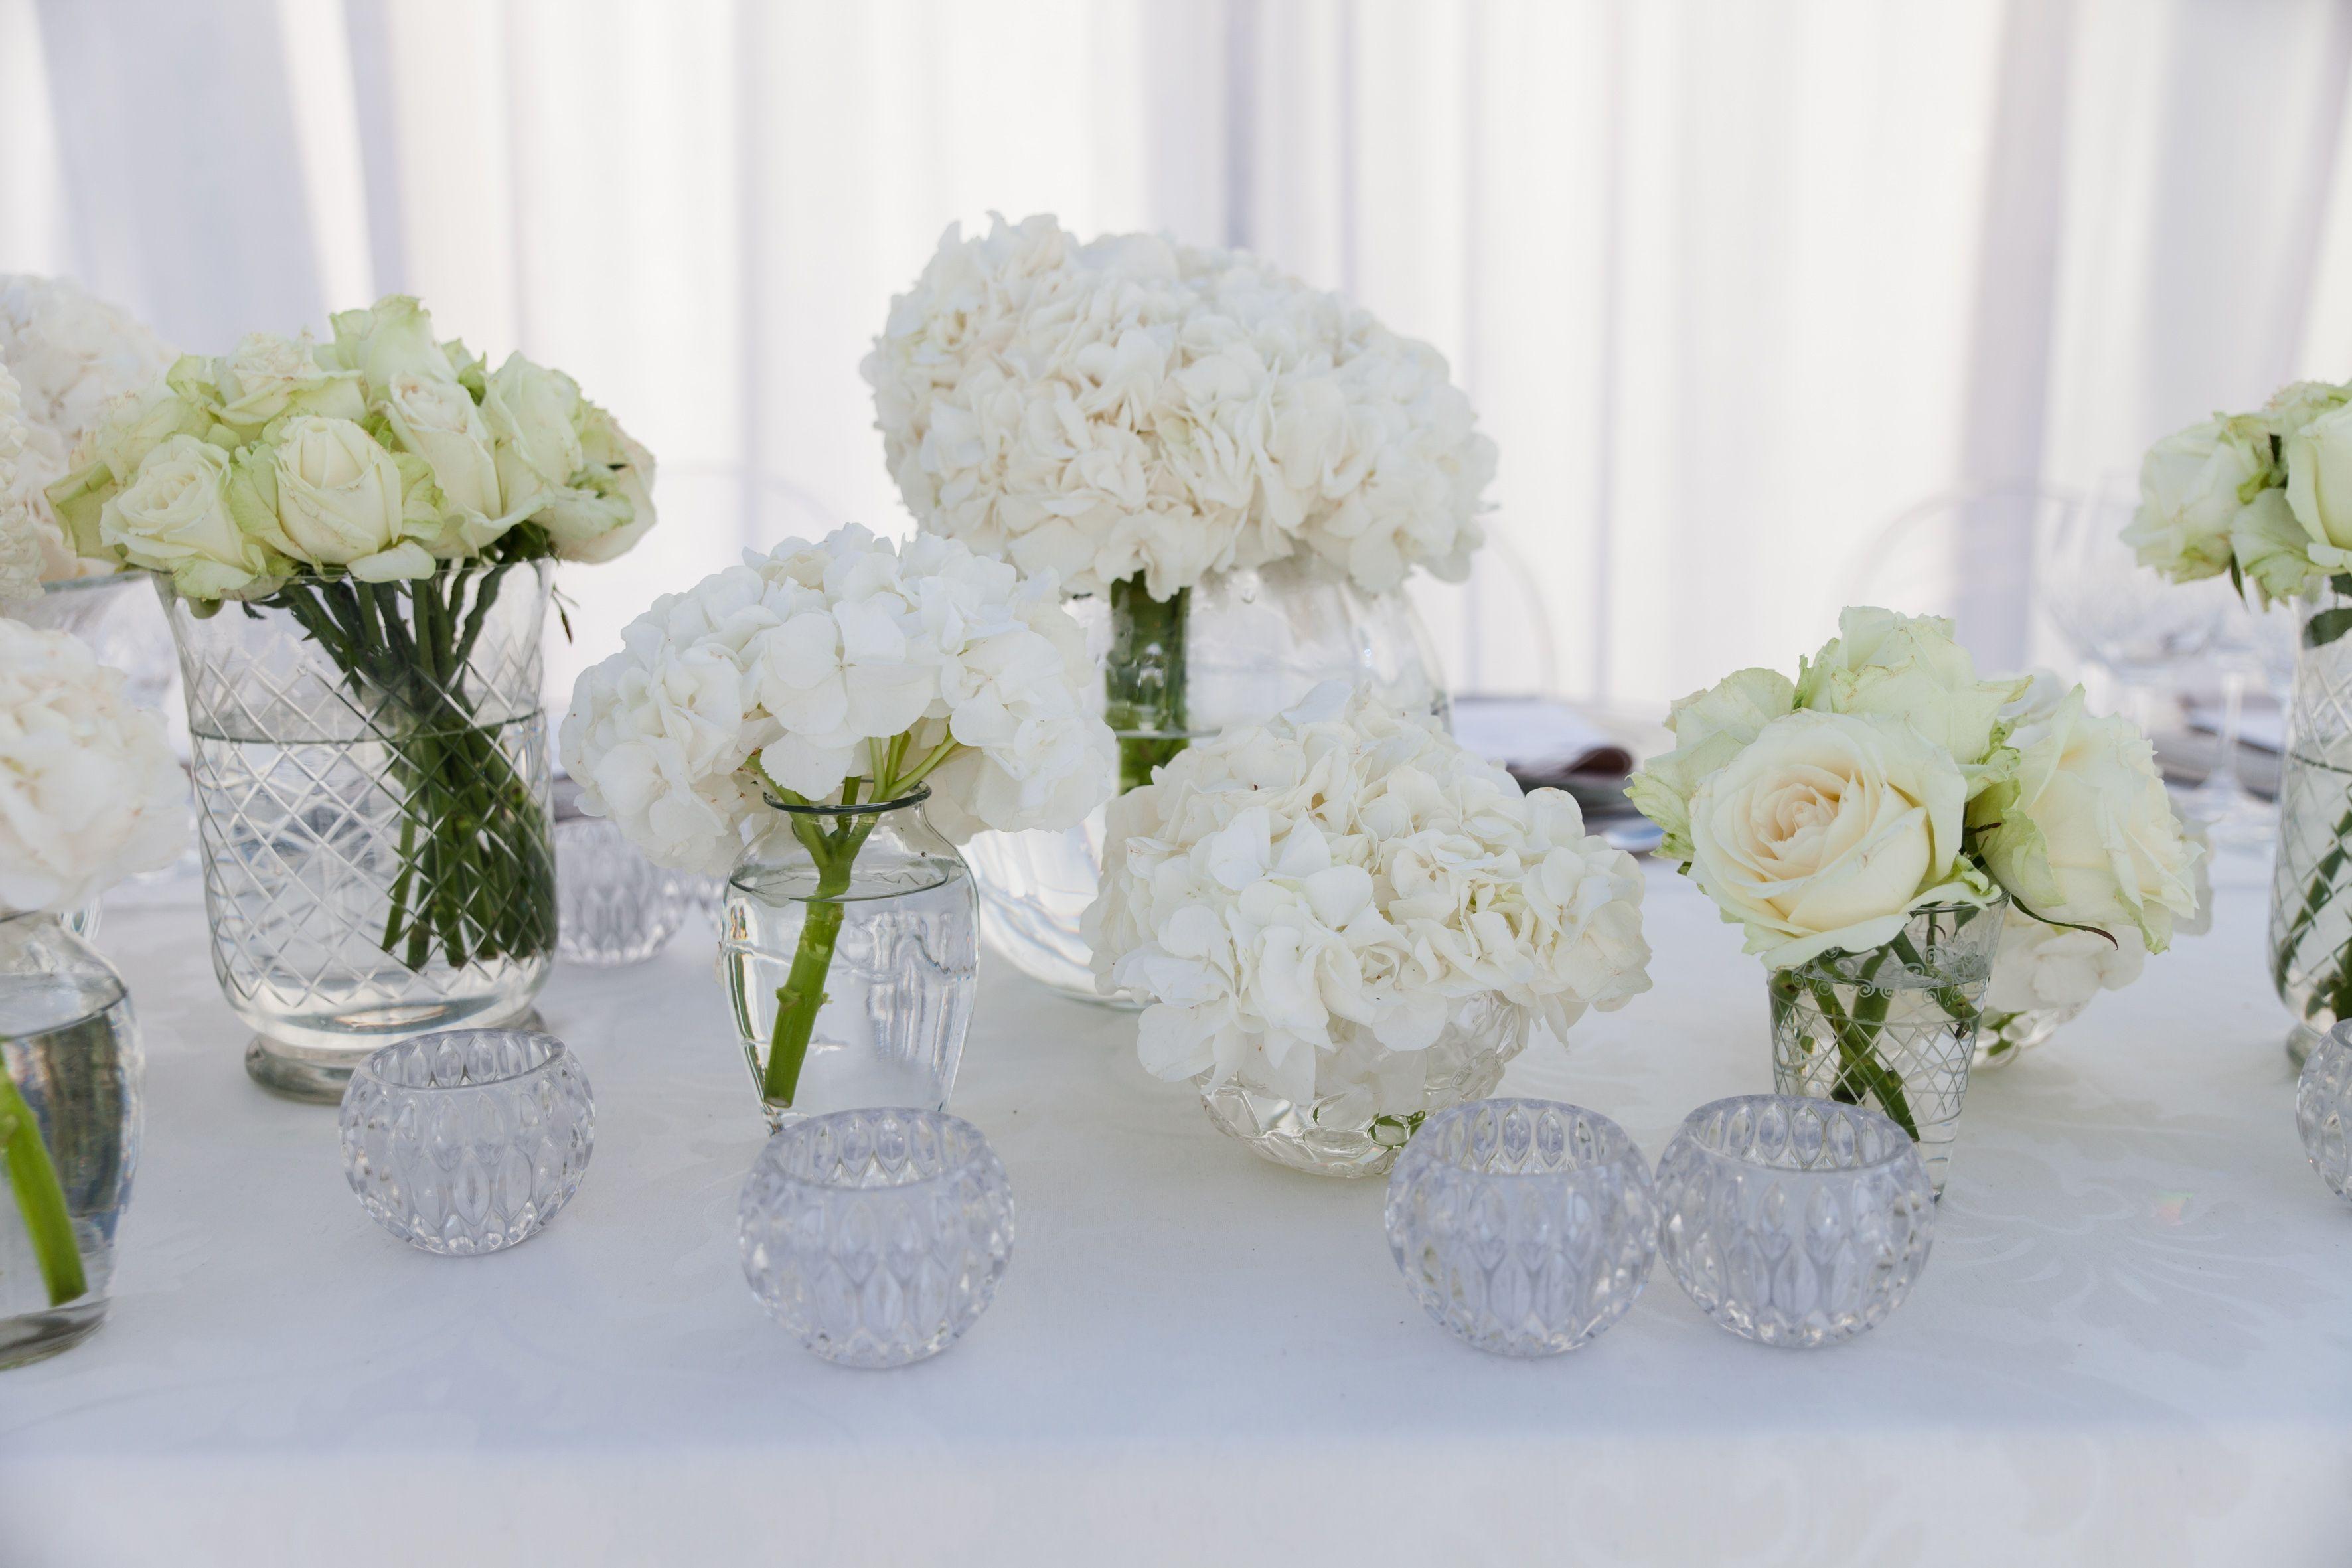 Classic White Flower Arrangement For Tables At Wedding Flower